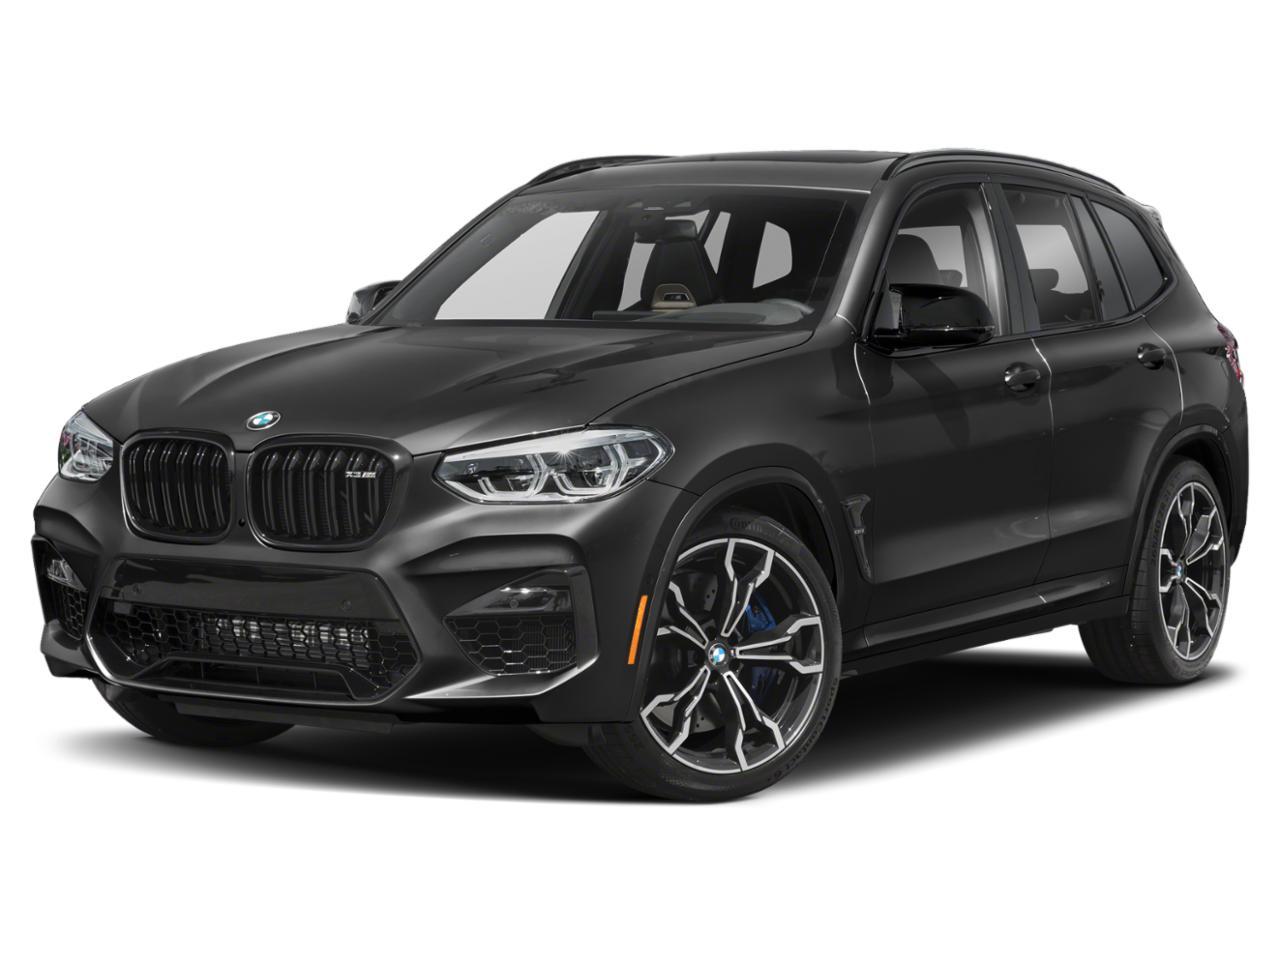 2020 BMW X3 M Vehicle Photo in Grapevine, TX 76051